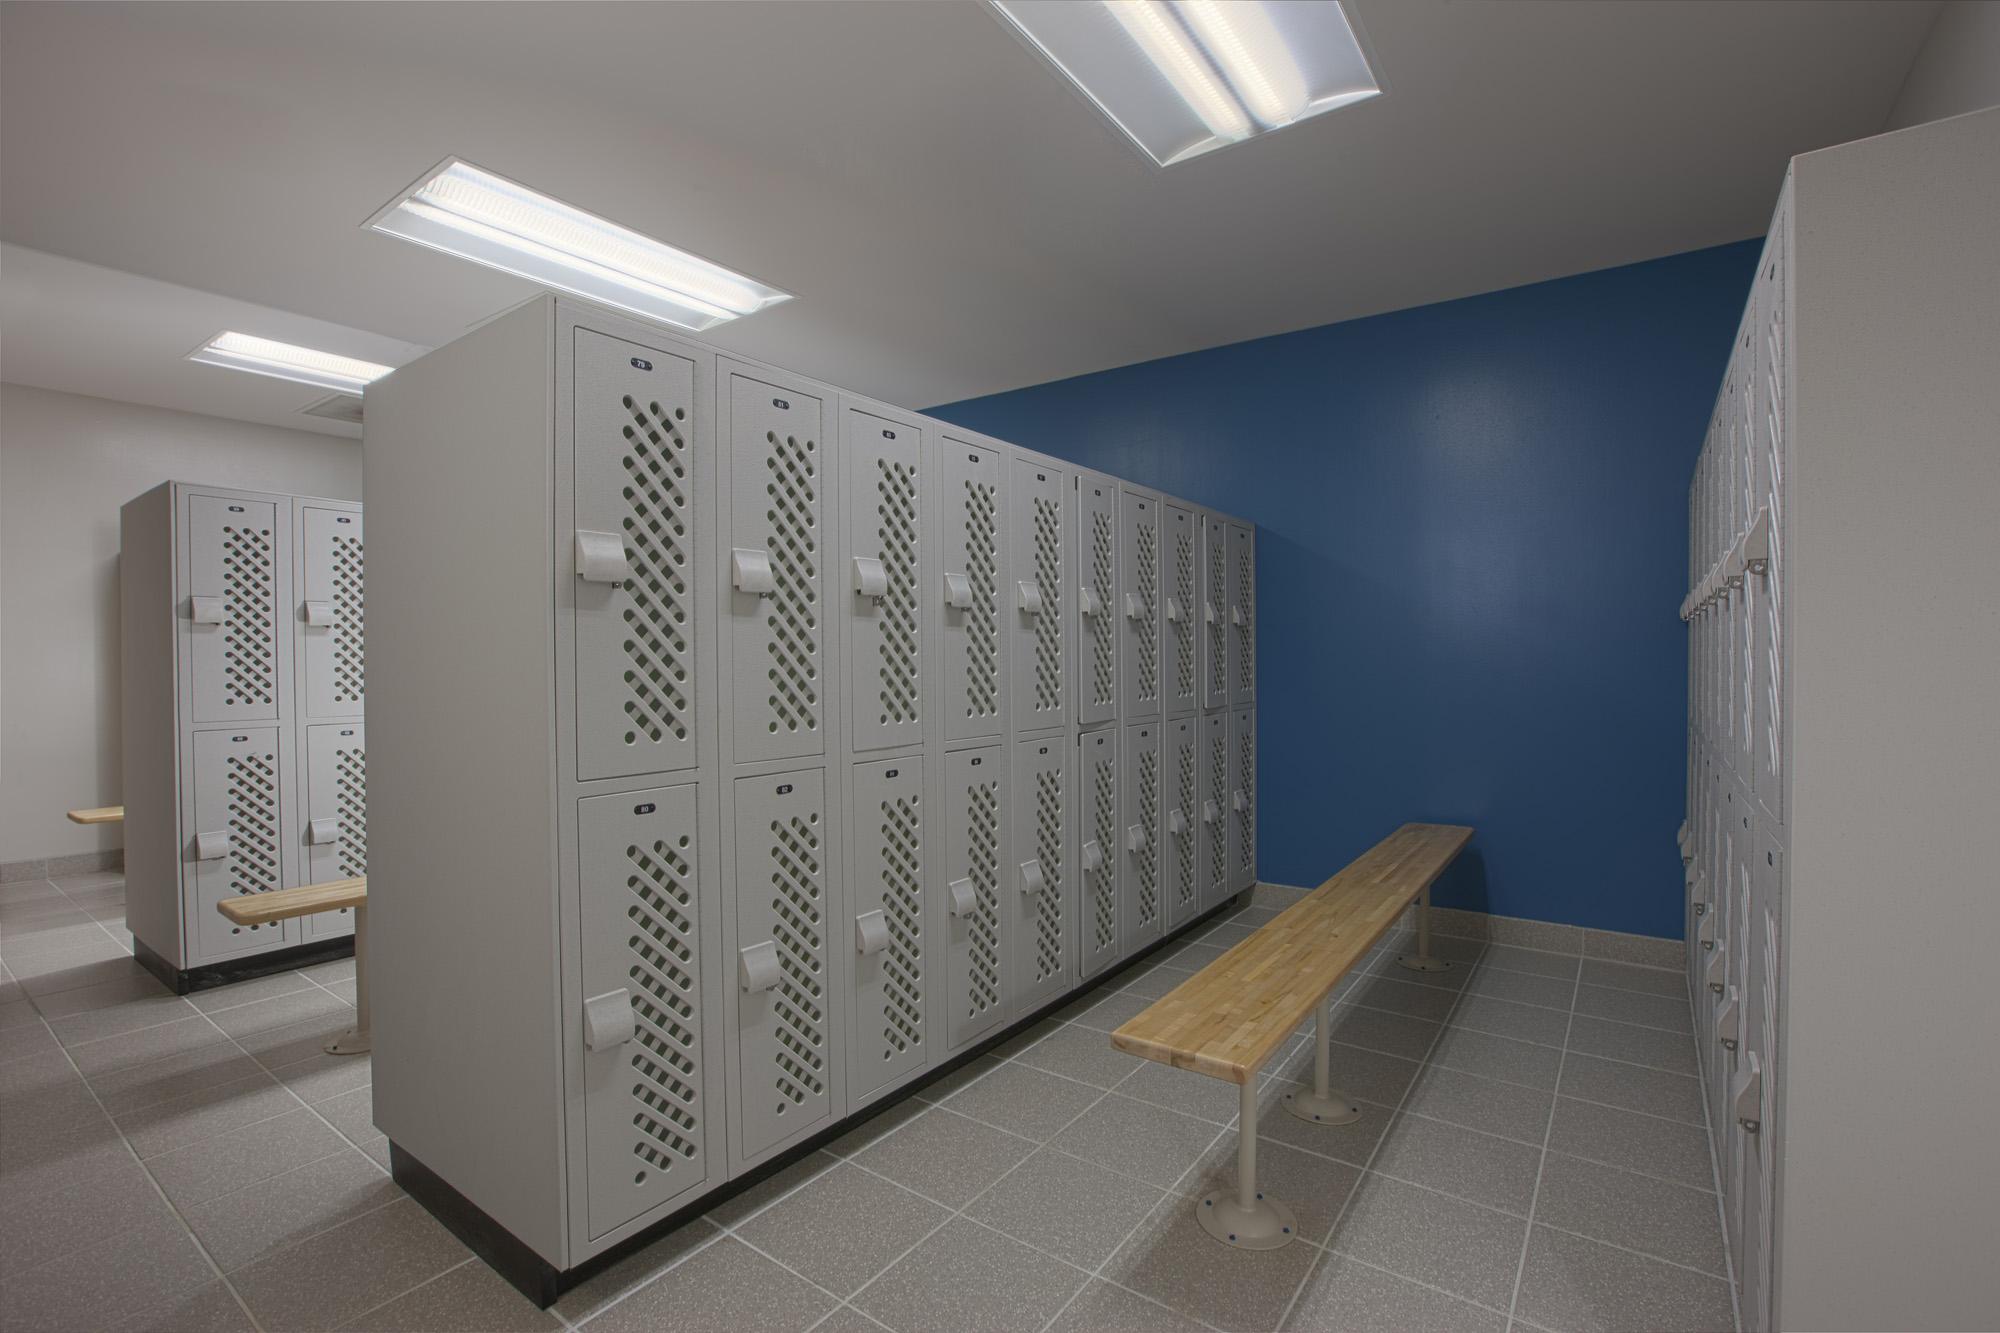 Bald Eagle Rec Center Interior Image-145472.jpg